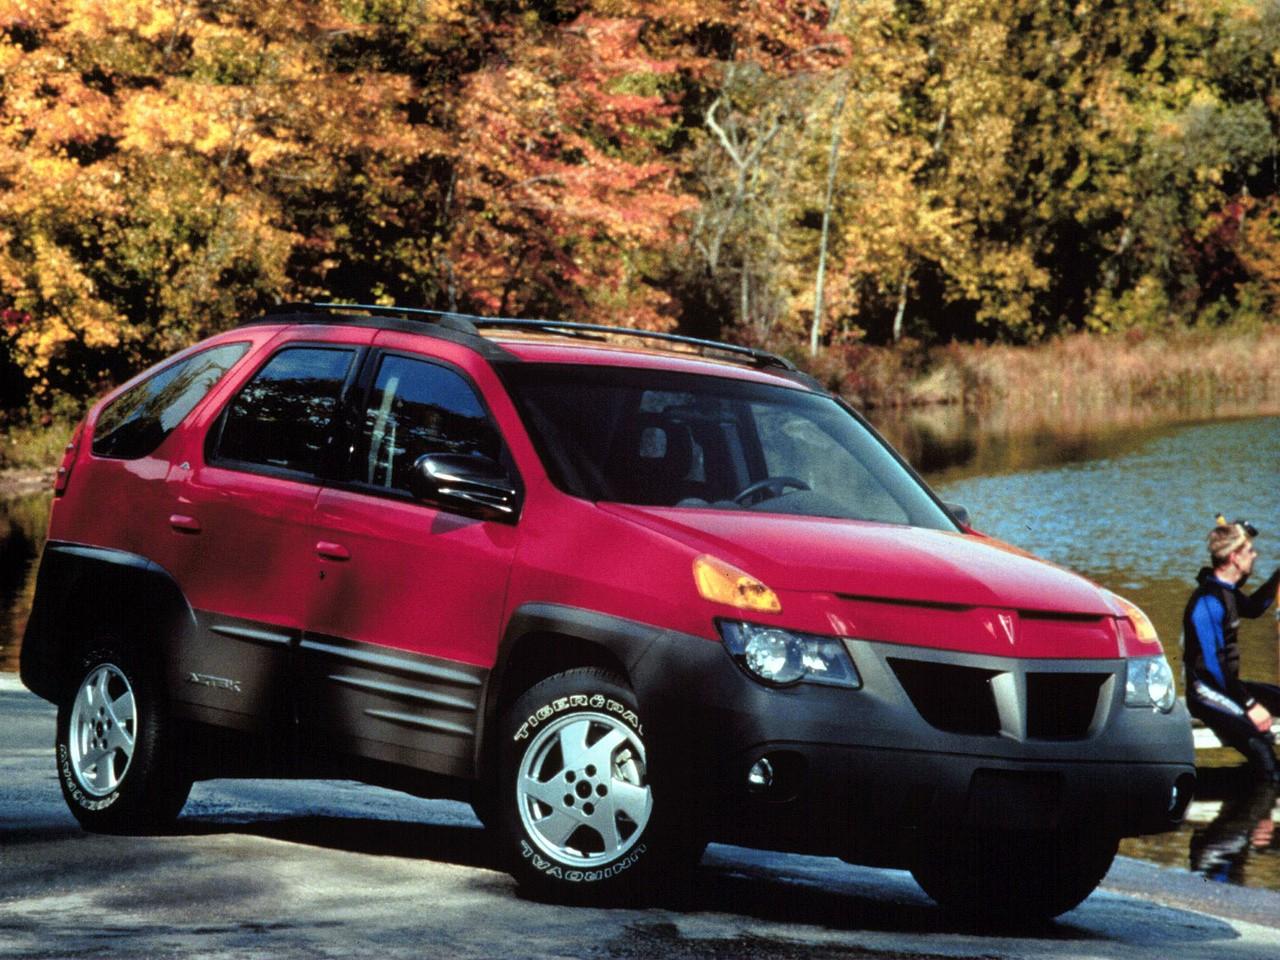 Knight Rider Car For Sale >> PONTIAC Aztek specs & photos - 2000, 2001, 2002, 2003 ...